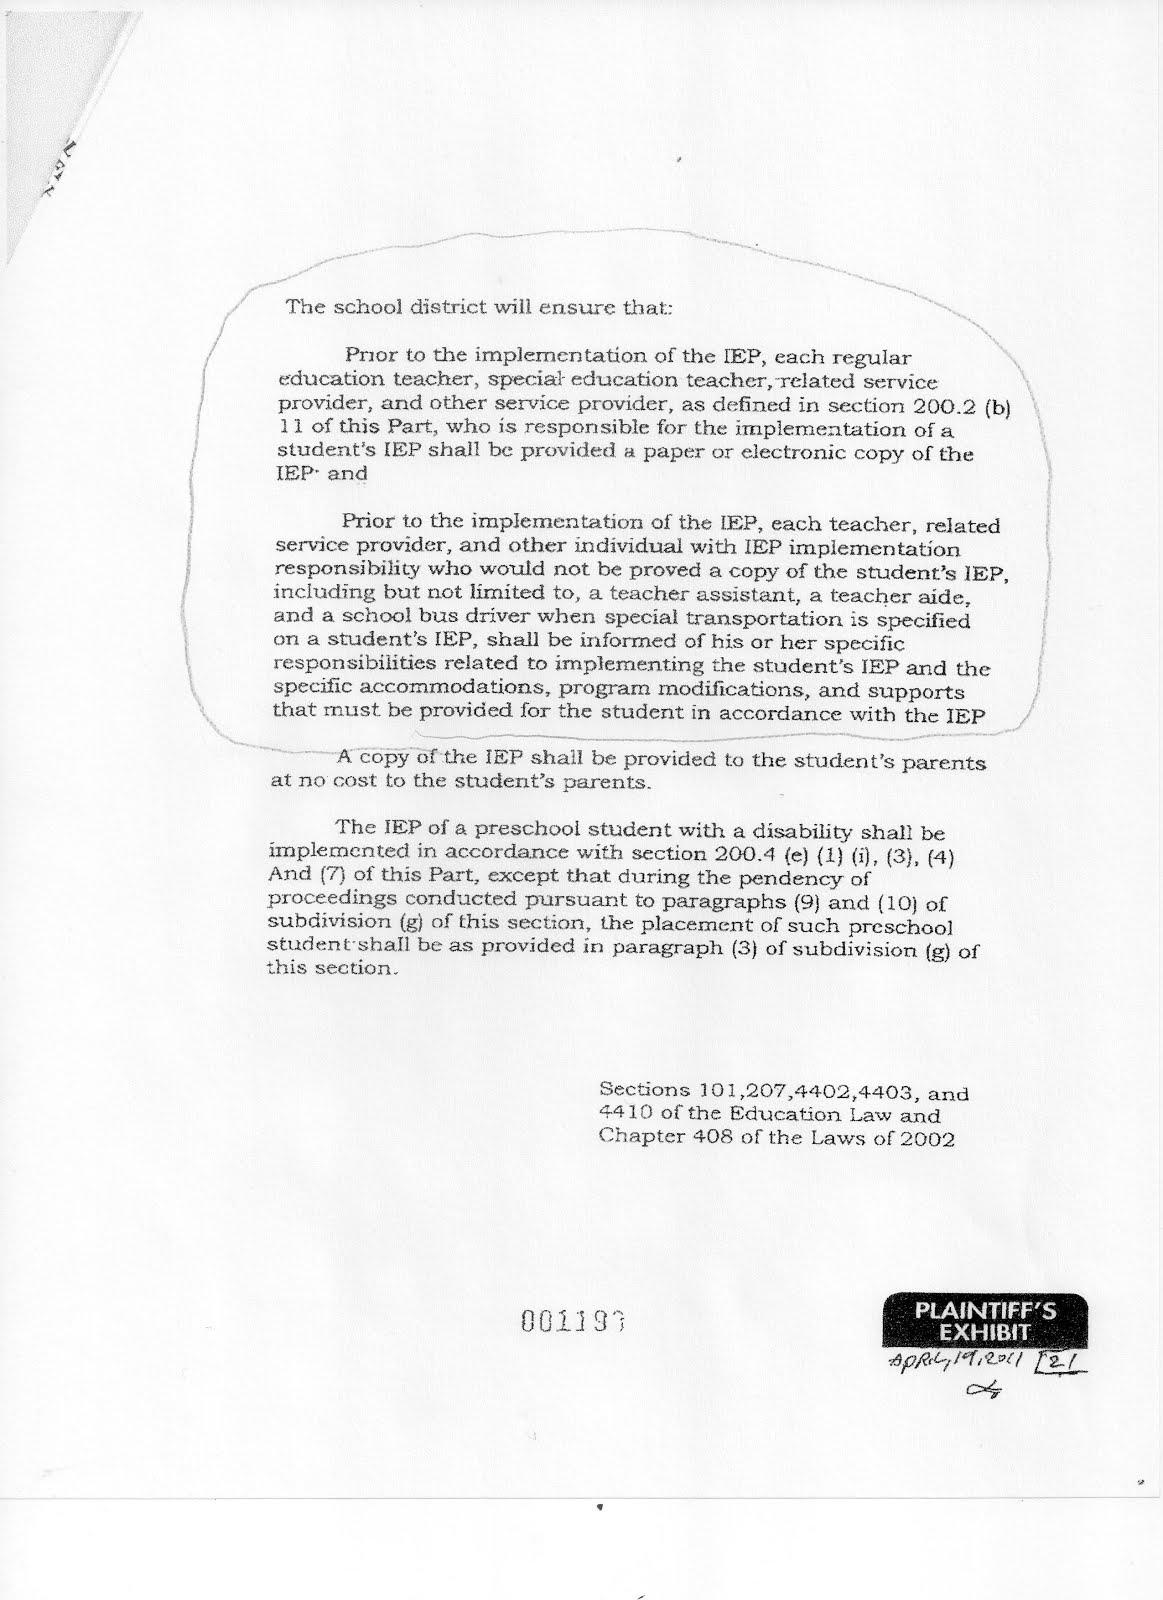 IEP Education Law